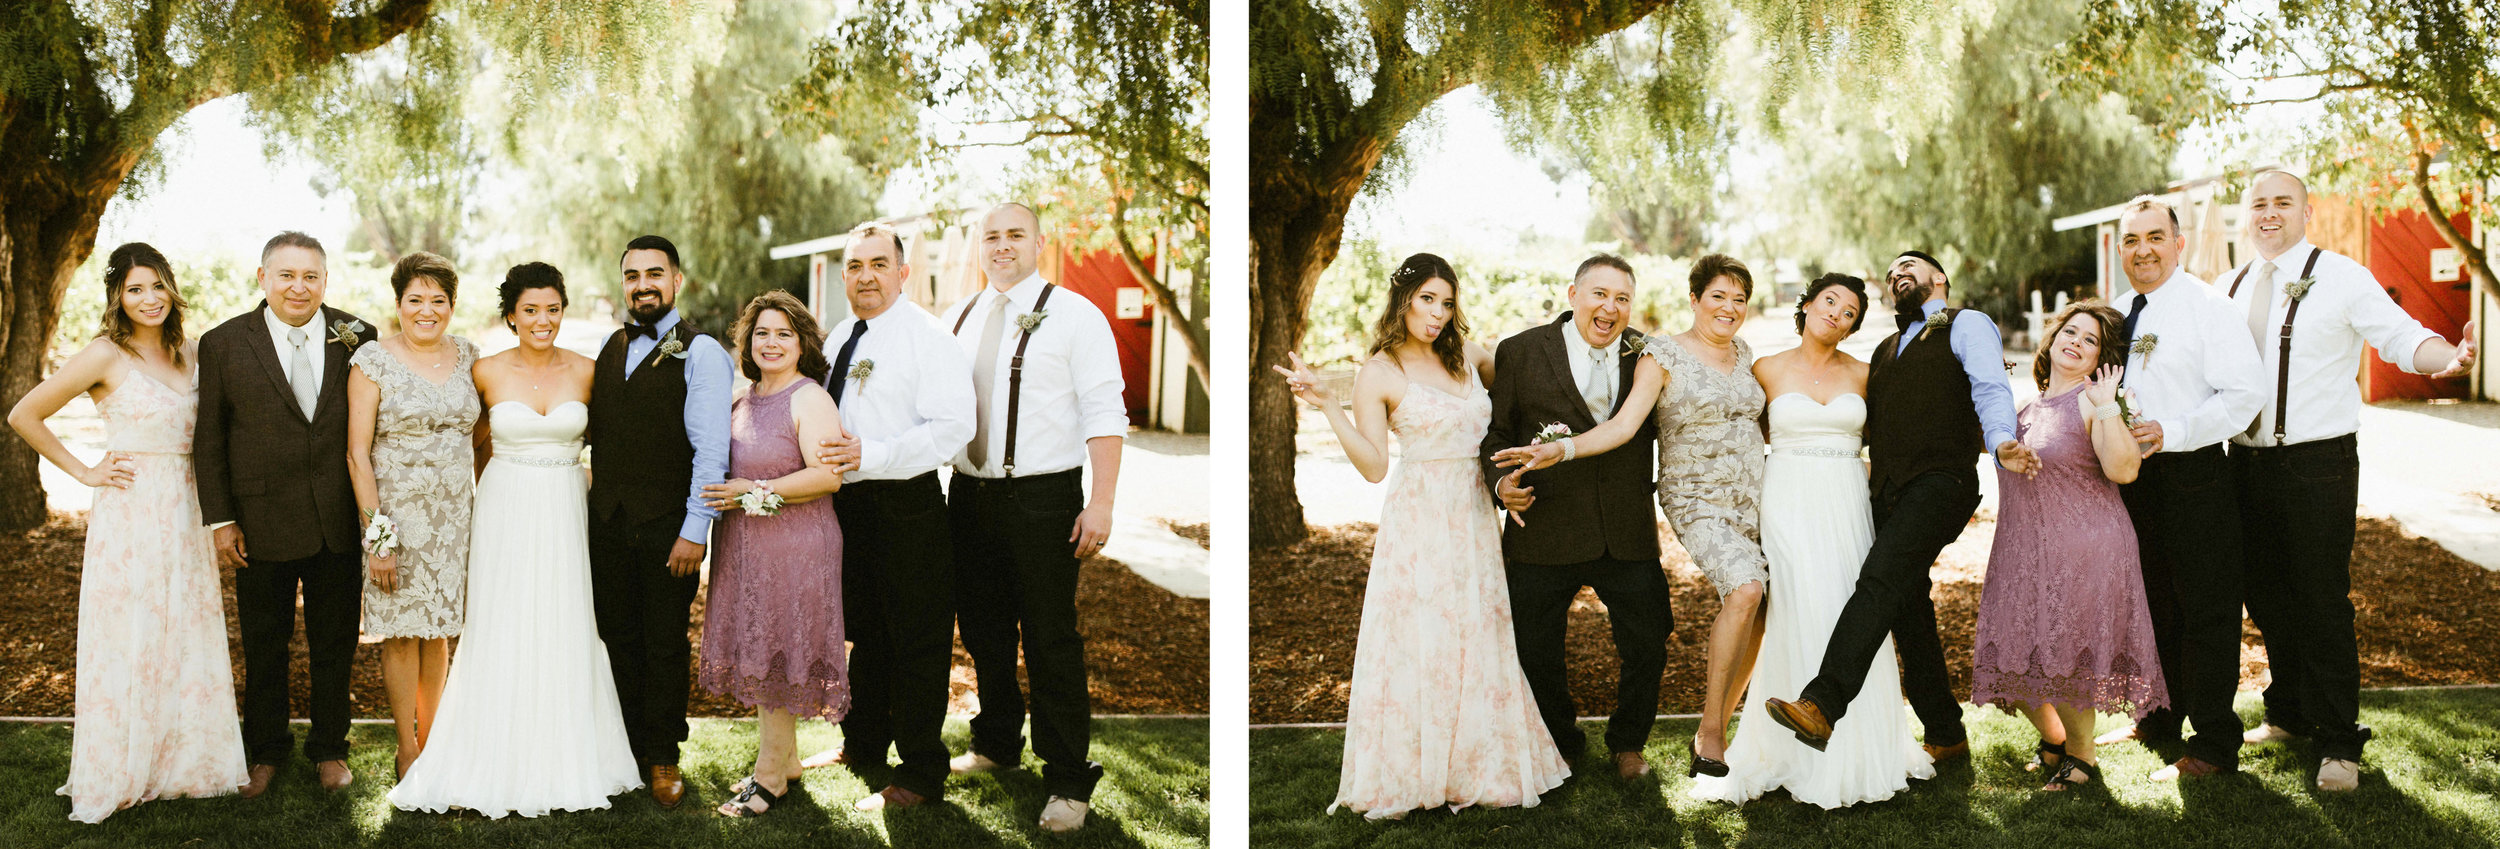 Retzlaff Wedding_3.jpg